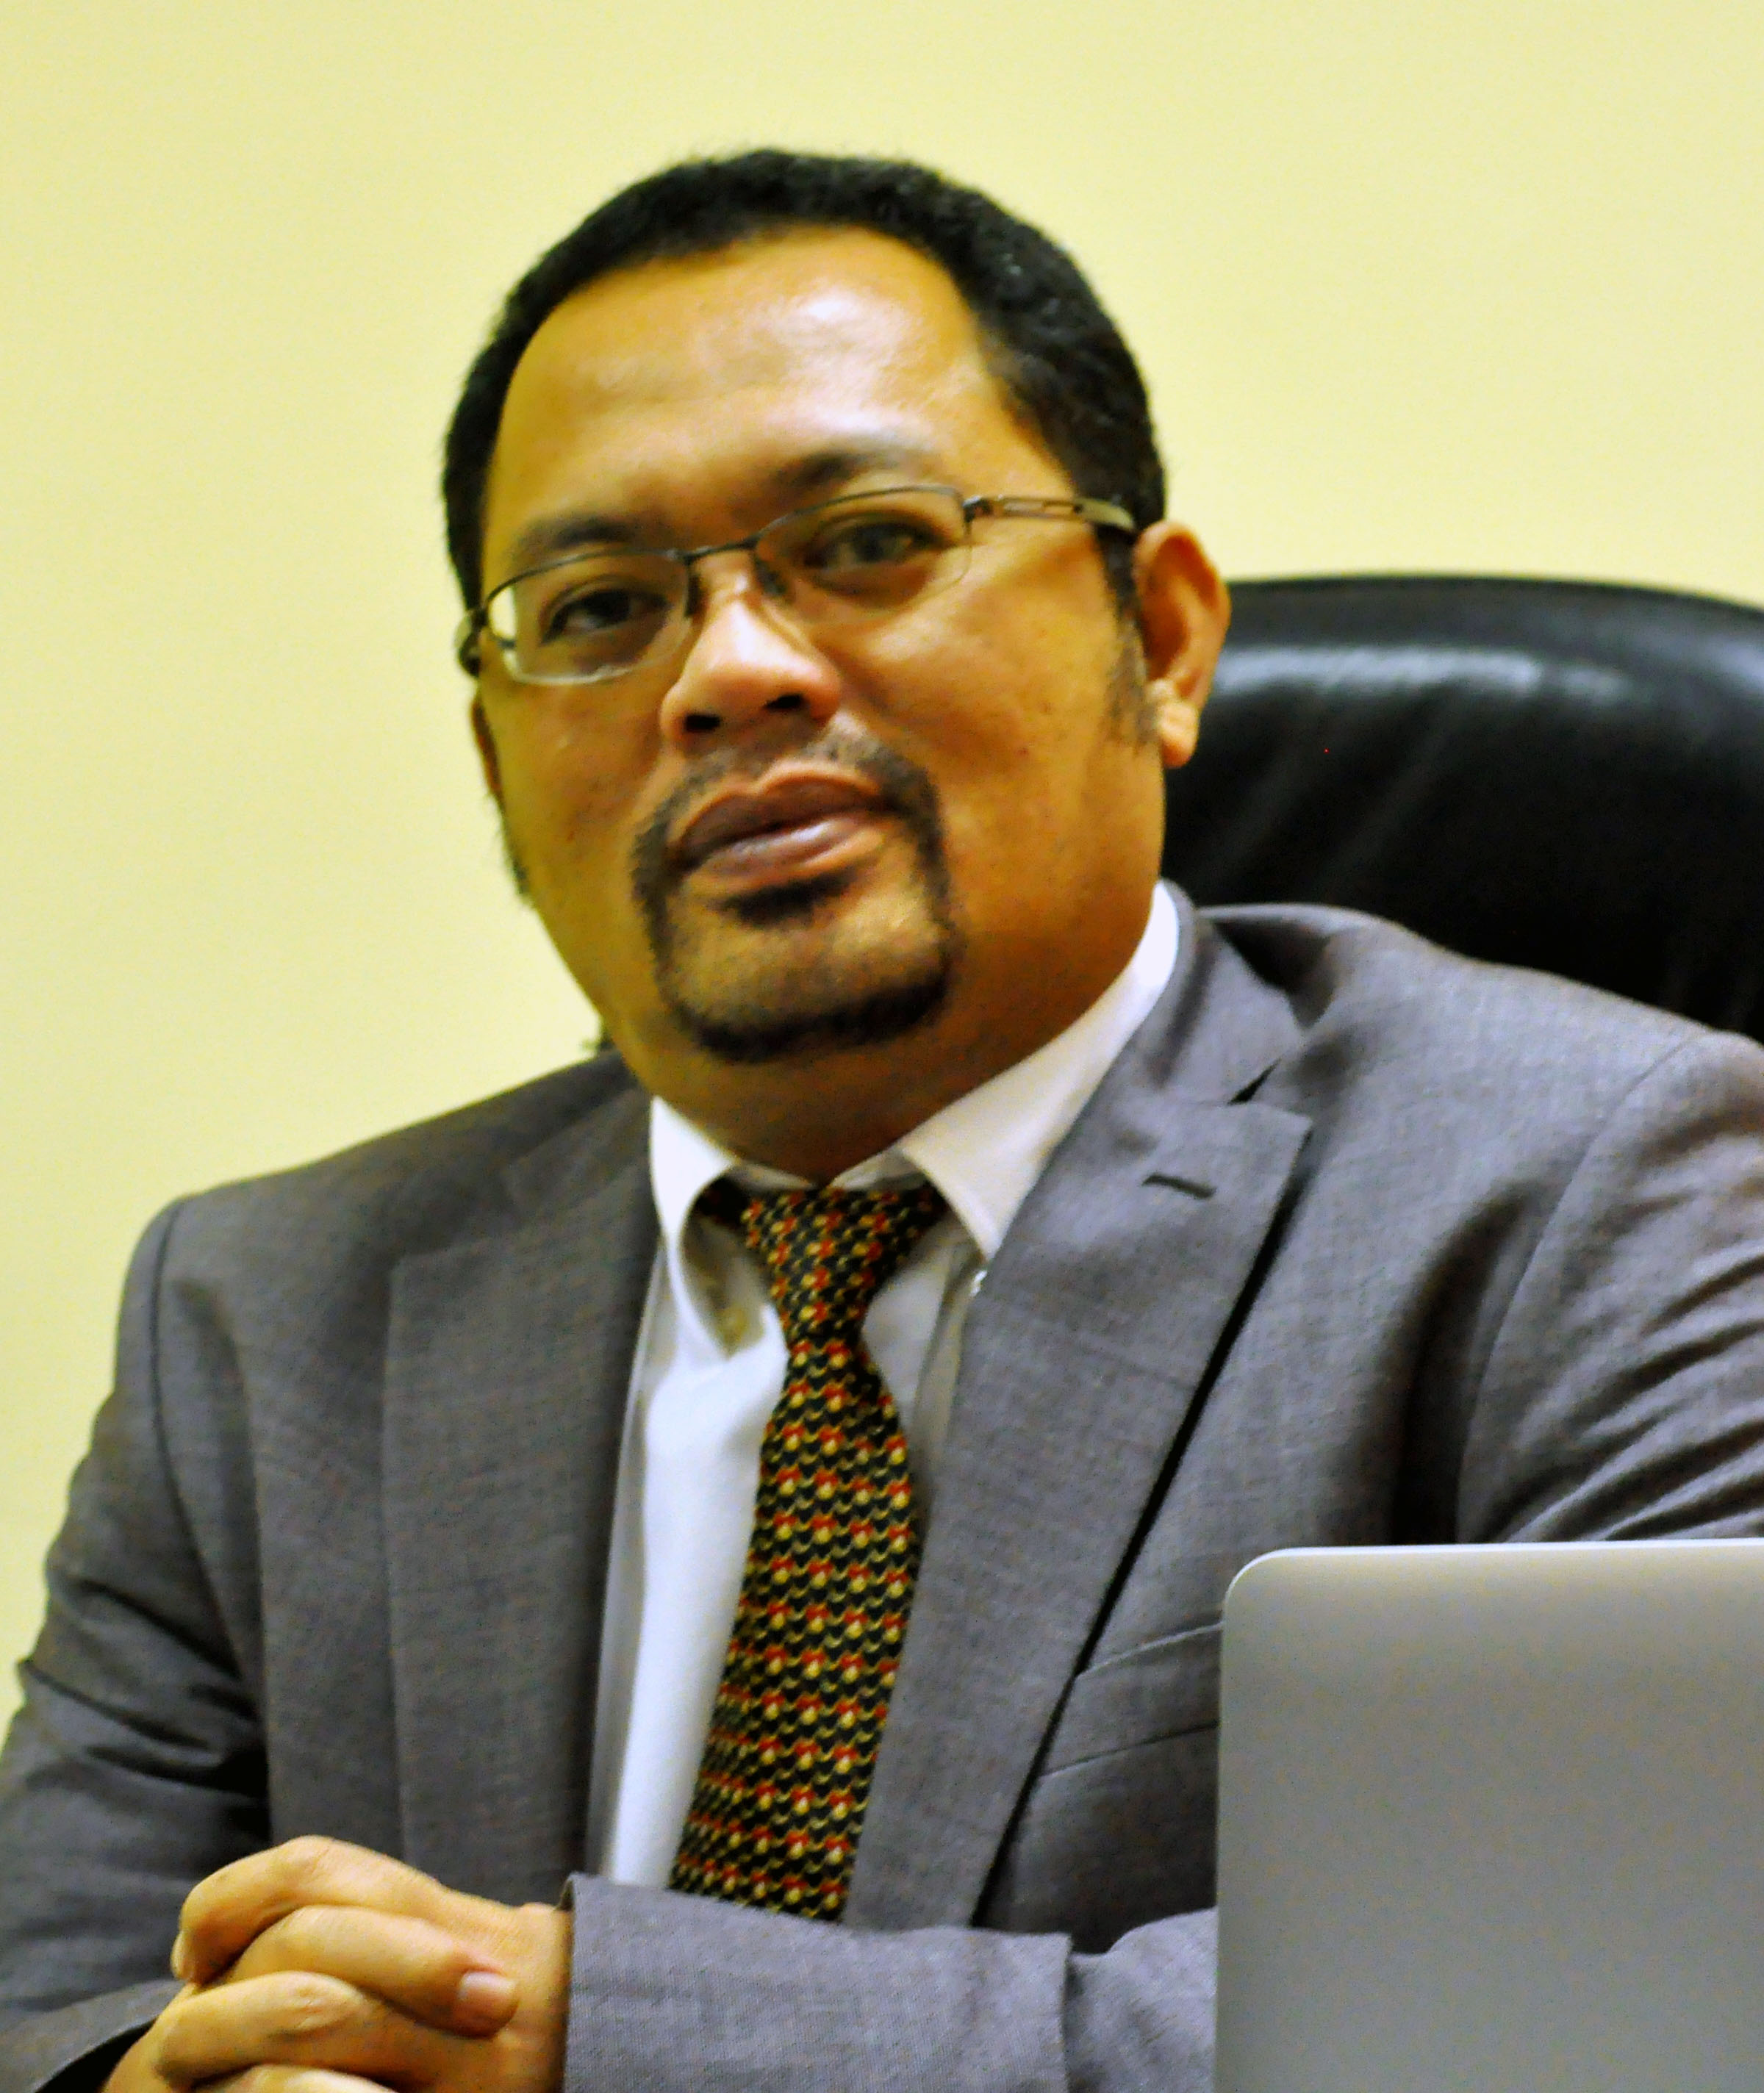 FEB Segera Tawarkan Program MM dan Maksi Syariah